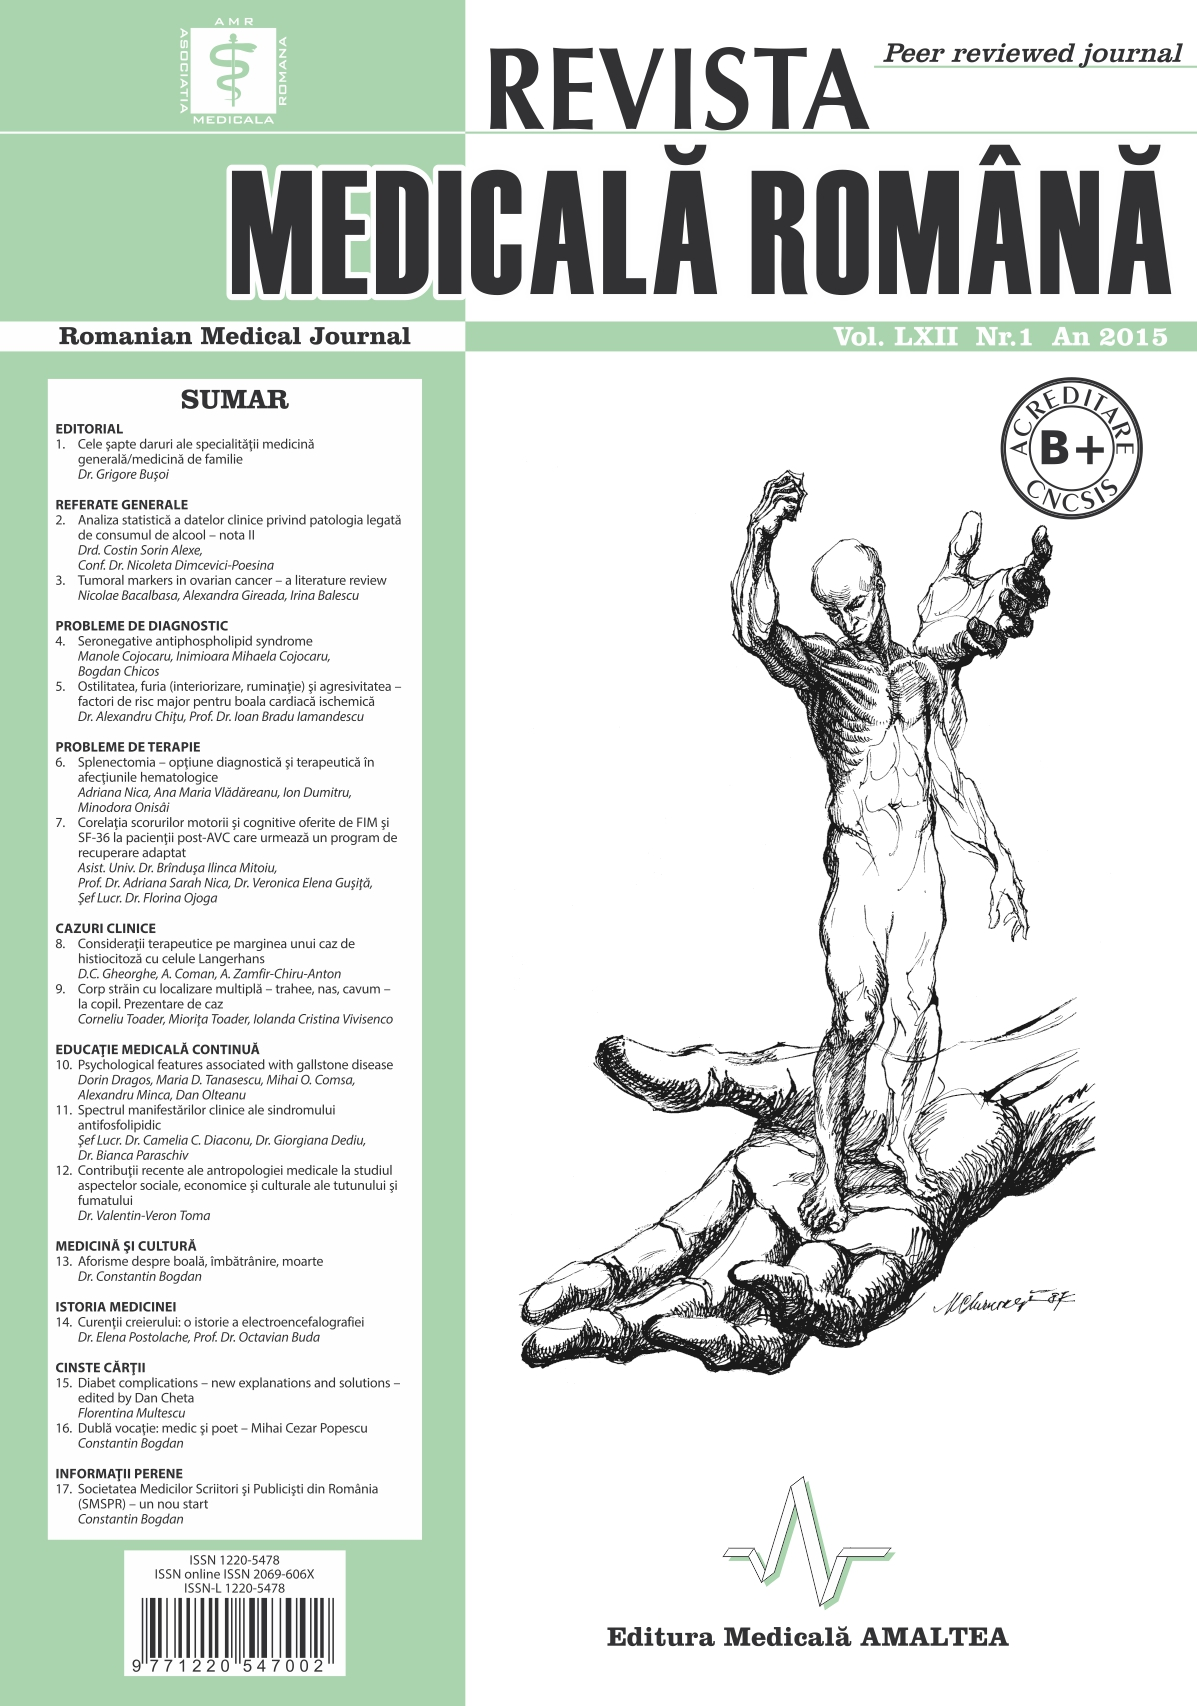 REVISTA MEDICALA ROMANA - Romanian Medical Journal, Vol. LXII, Nr. 1, An 2015